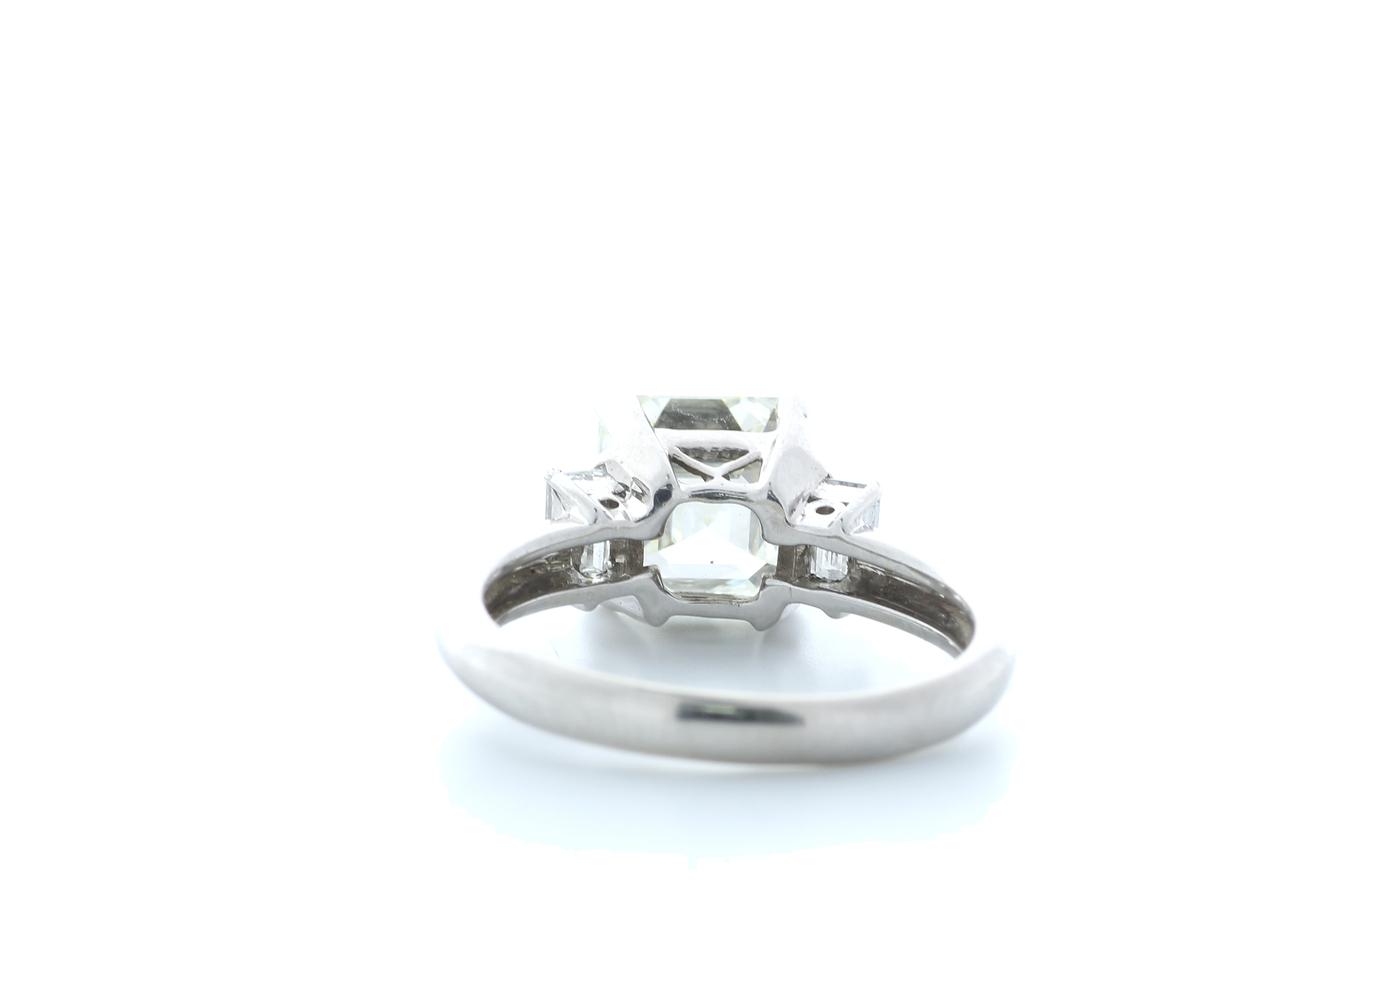 18ct White Gold Three Stone Claw Set Diamond Ring 3.11(2.70) Carats - Image 3 of 5